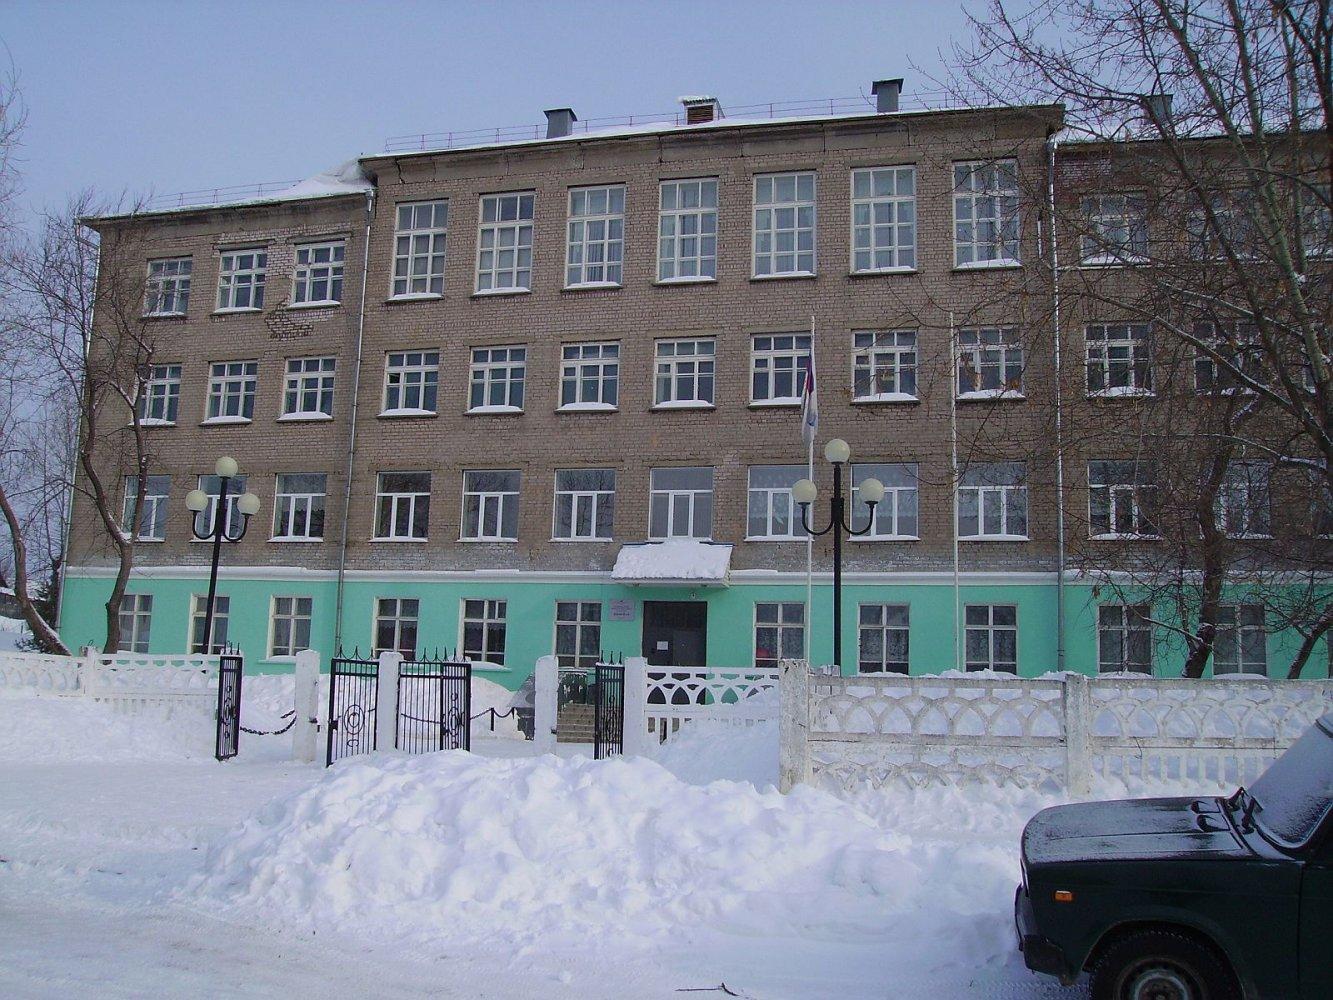 Фото Школа № 5. Россия, Пермский край, Лысьва, улица Чапаева, 75